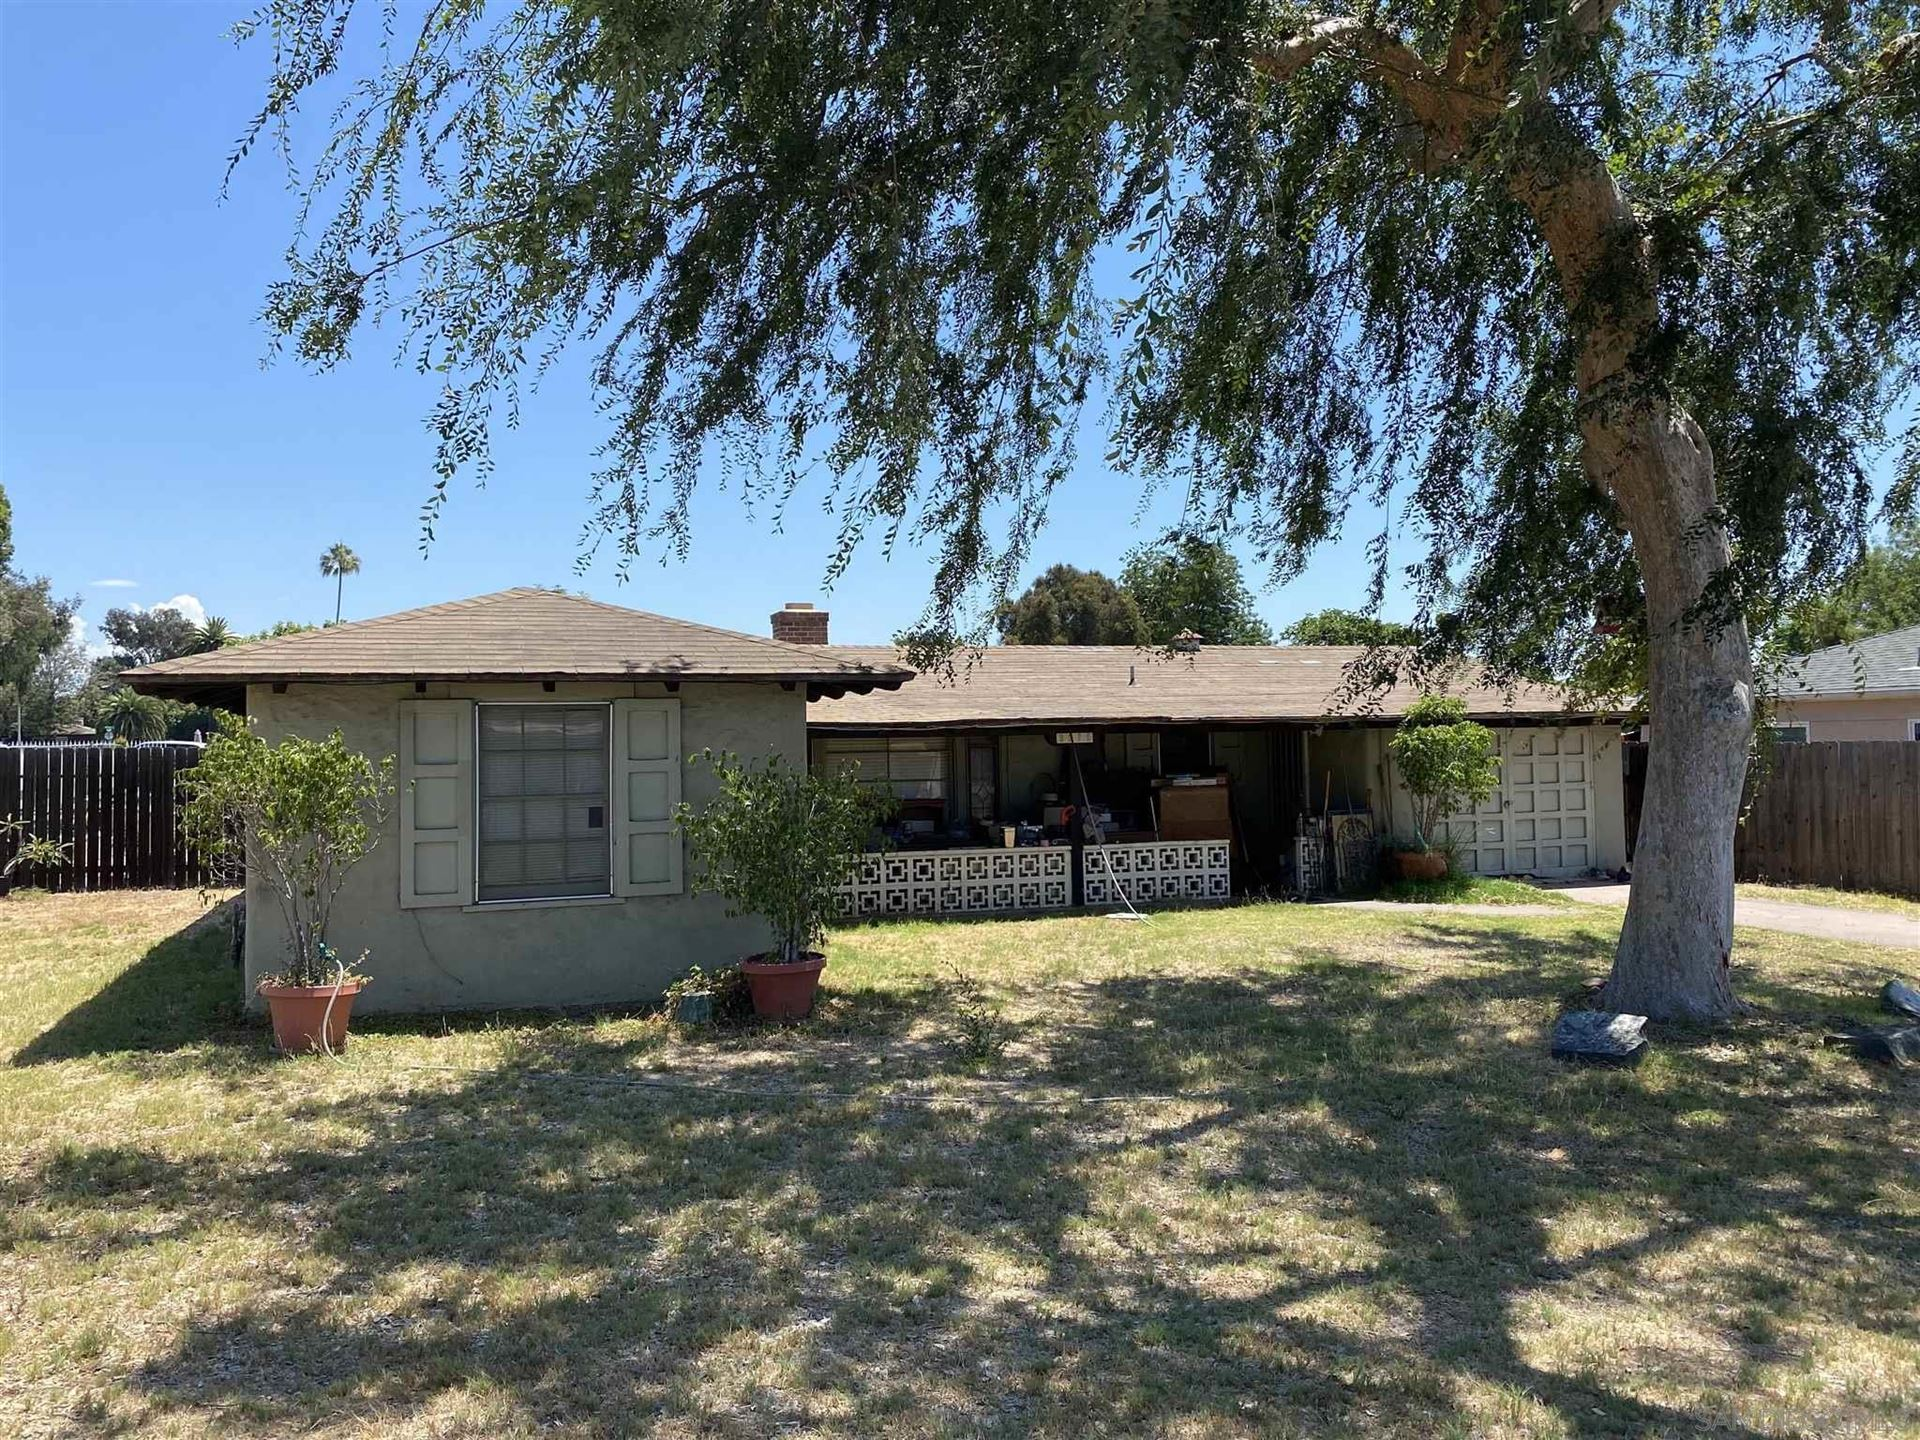 Photo of 3275 Acacia St, Lemon Grove, CA 91945 (MLS # 210021498)